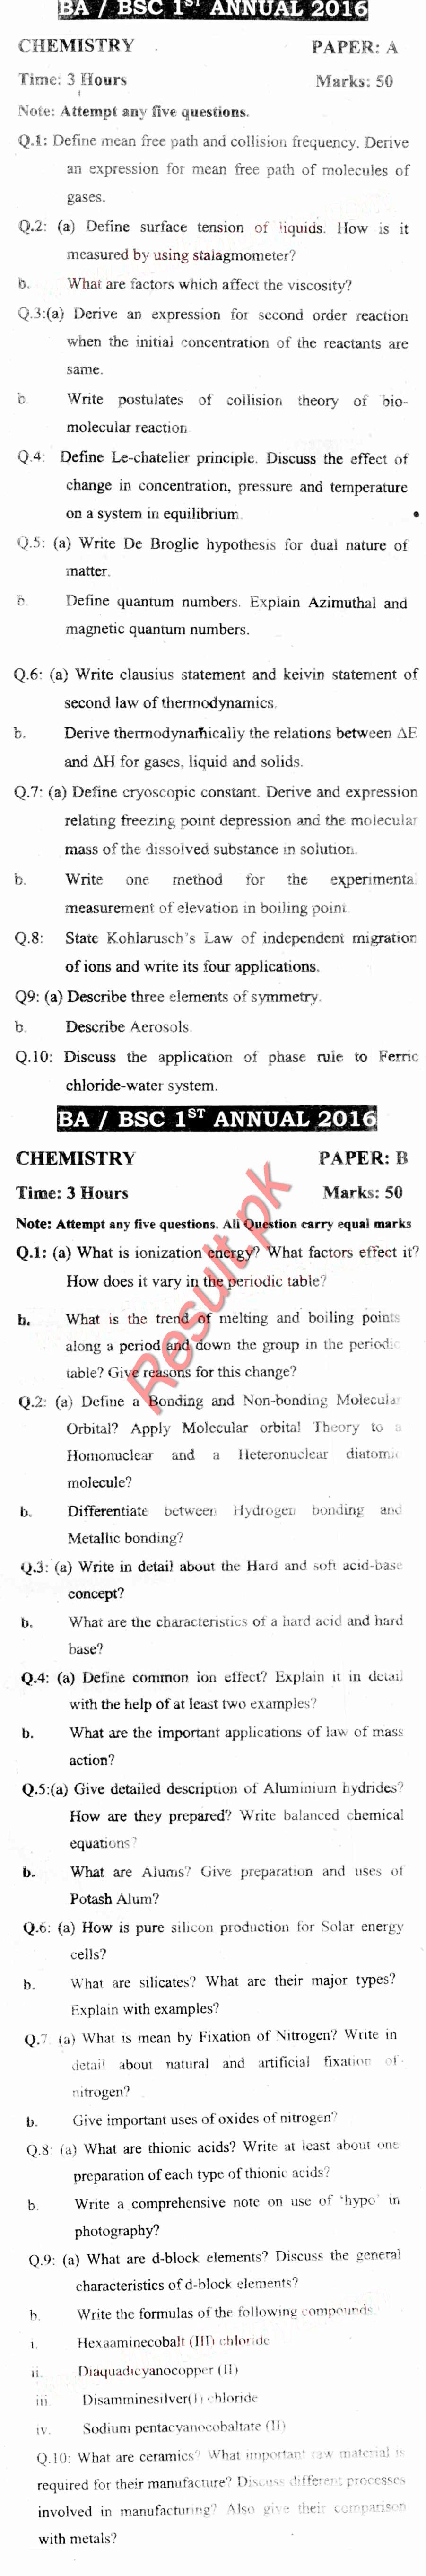 University of Sargodha Past Papers 2018, 2017, 2016, uos